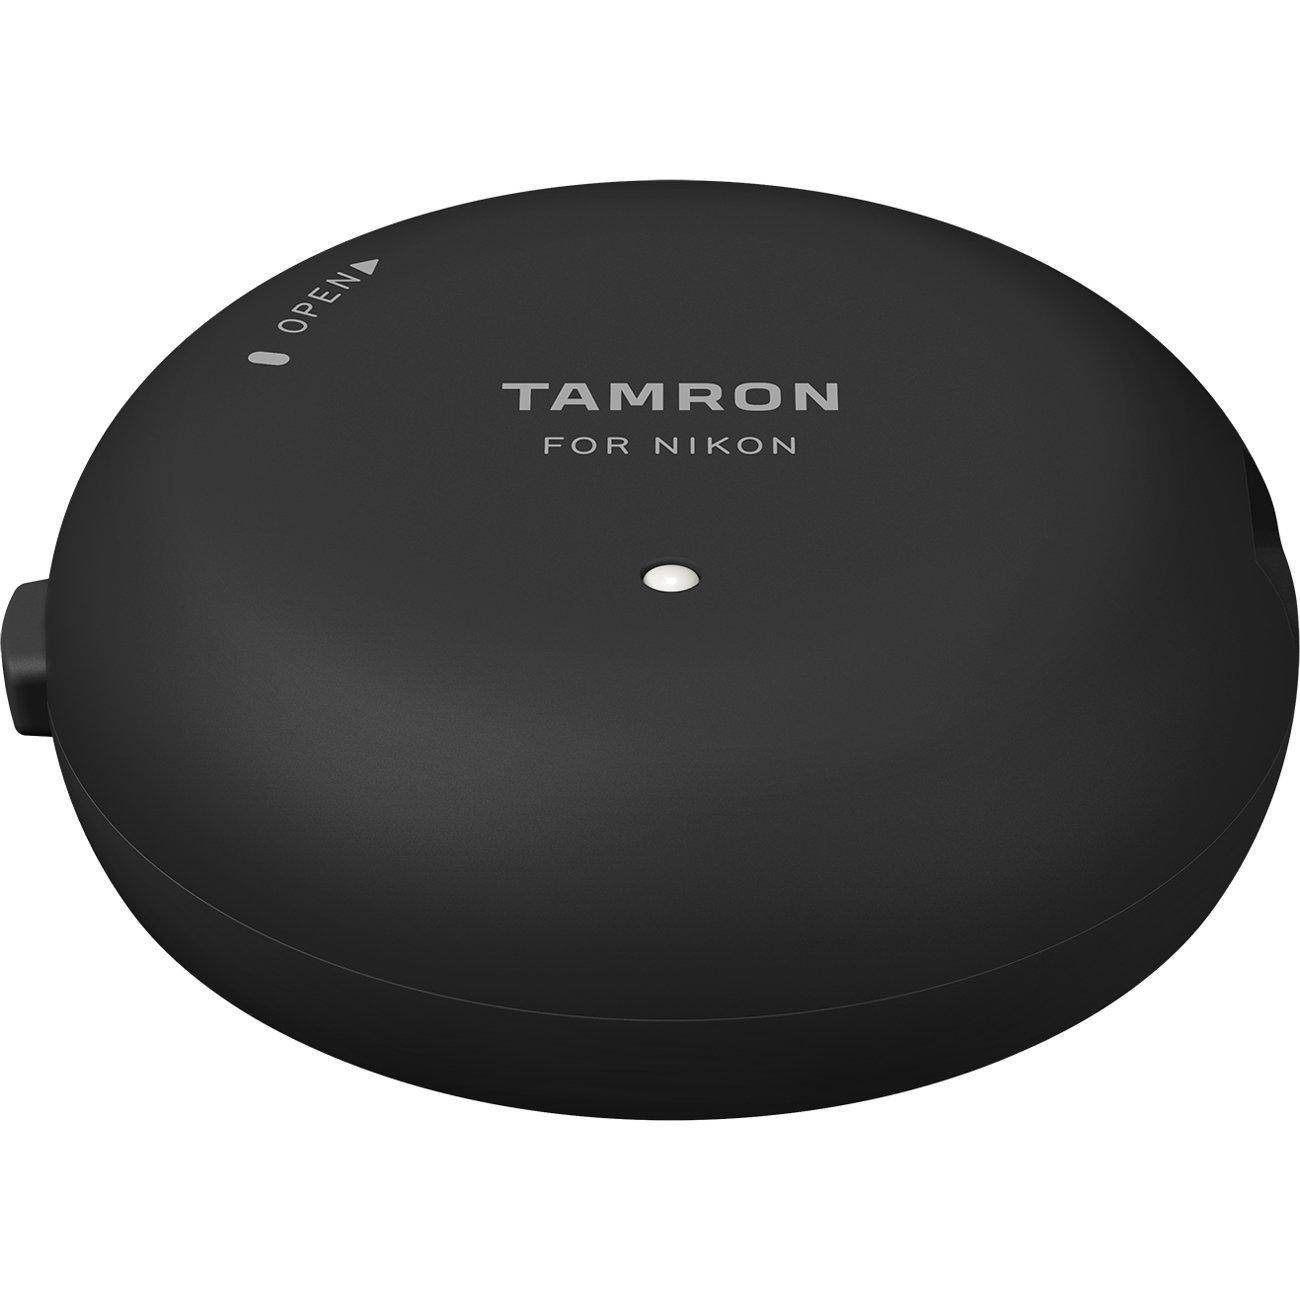 Tamron Tap-In-Console For Nikon, Black